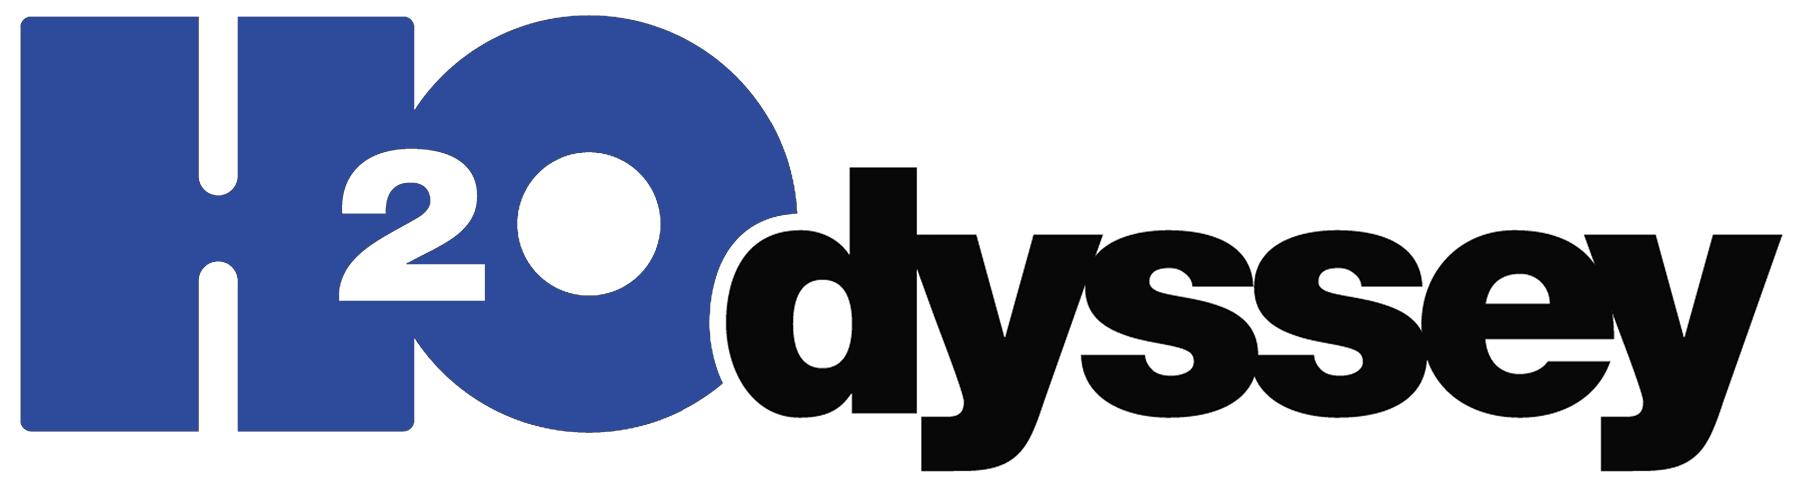 H2Odyssey Logo